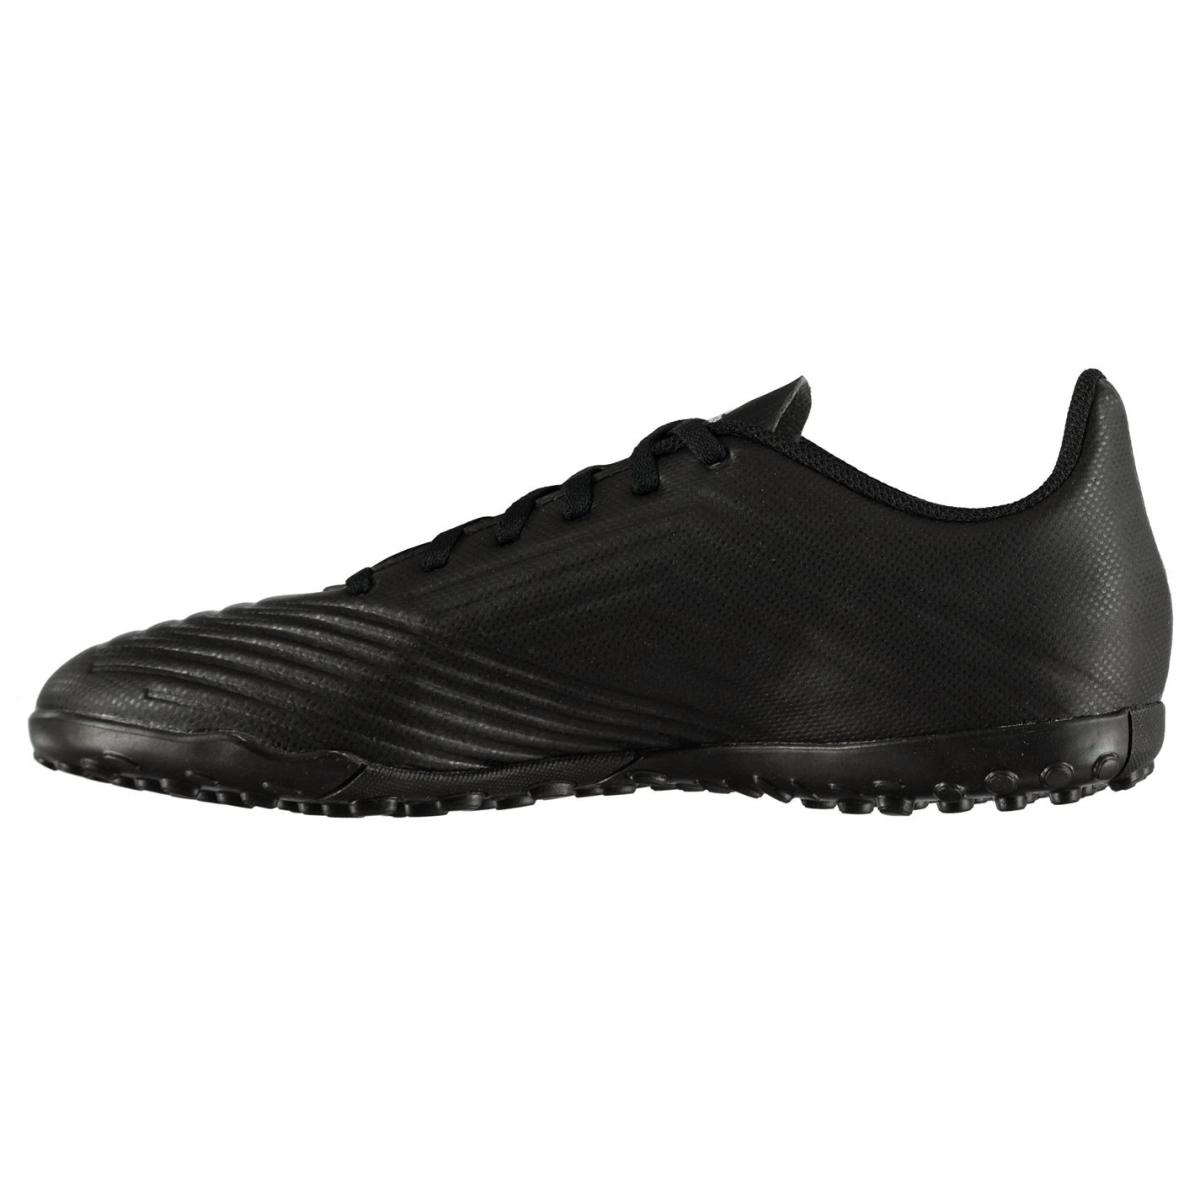 adidas Predator Tango 18.4 Herren AT Astro Turf Kunstrasen Fußballschuhe